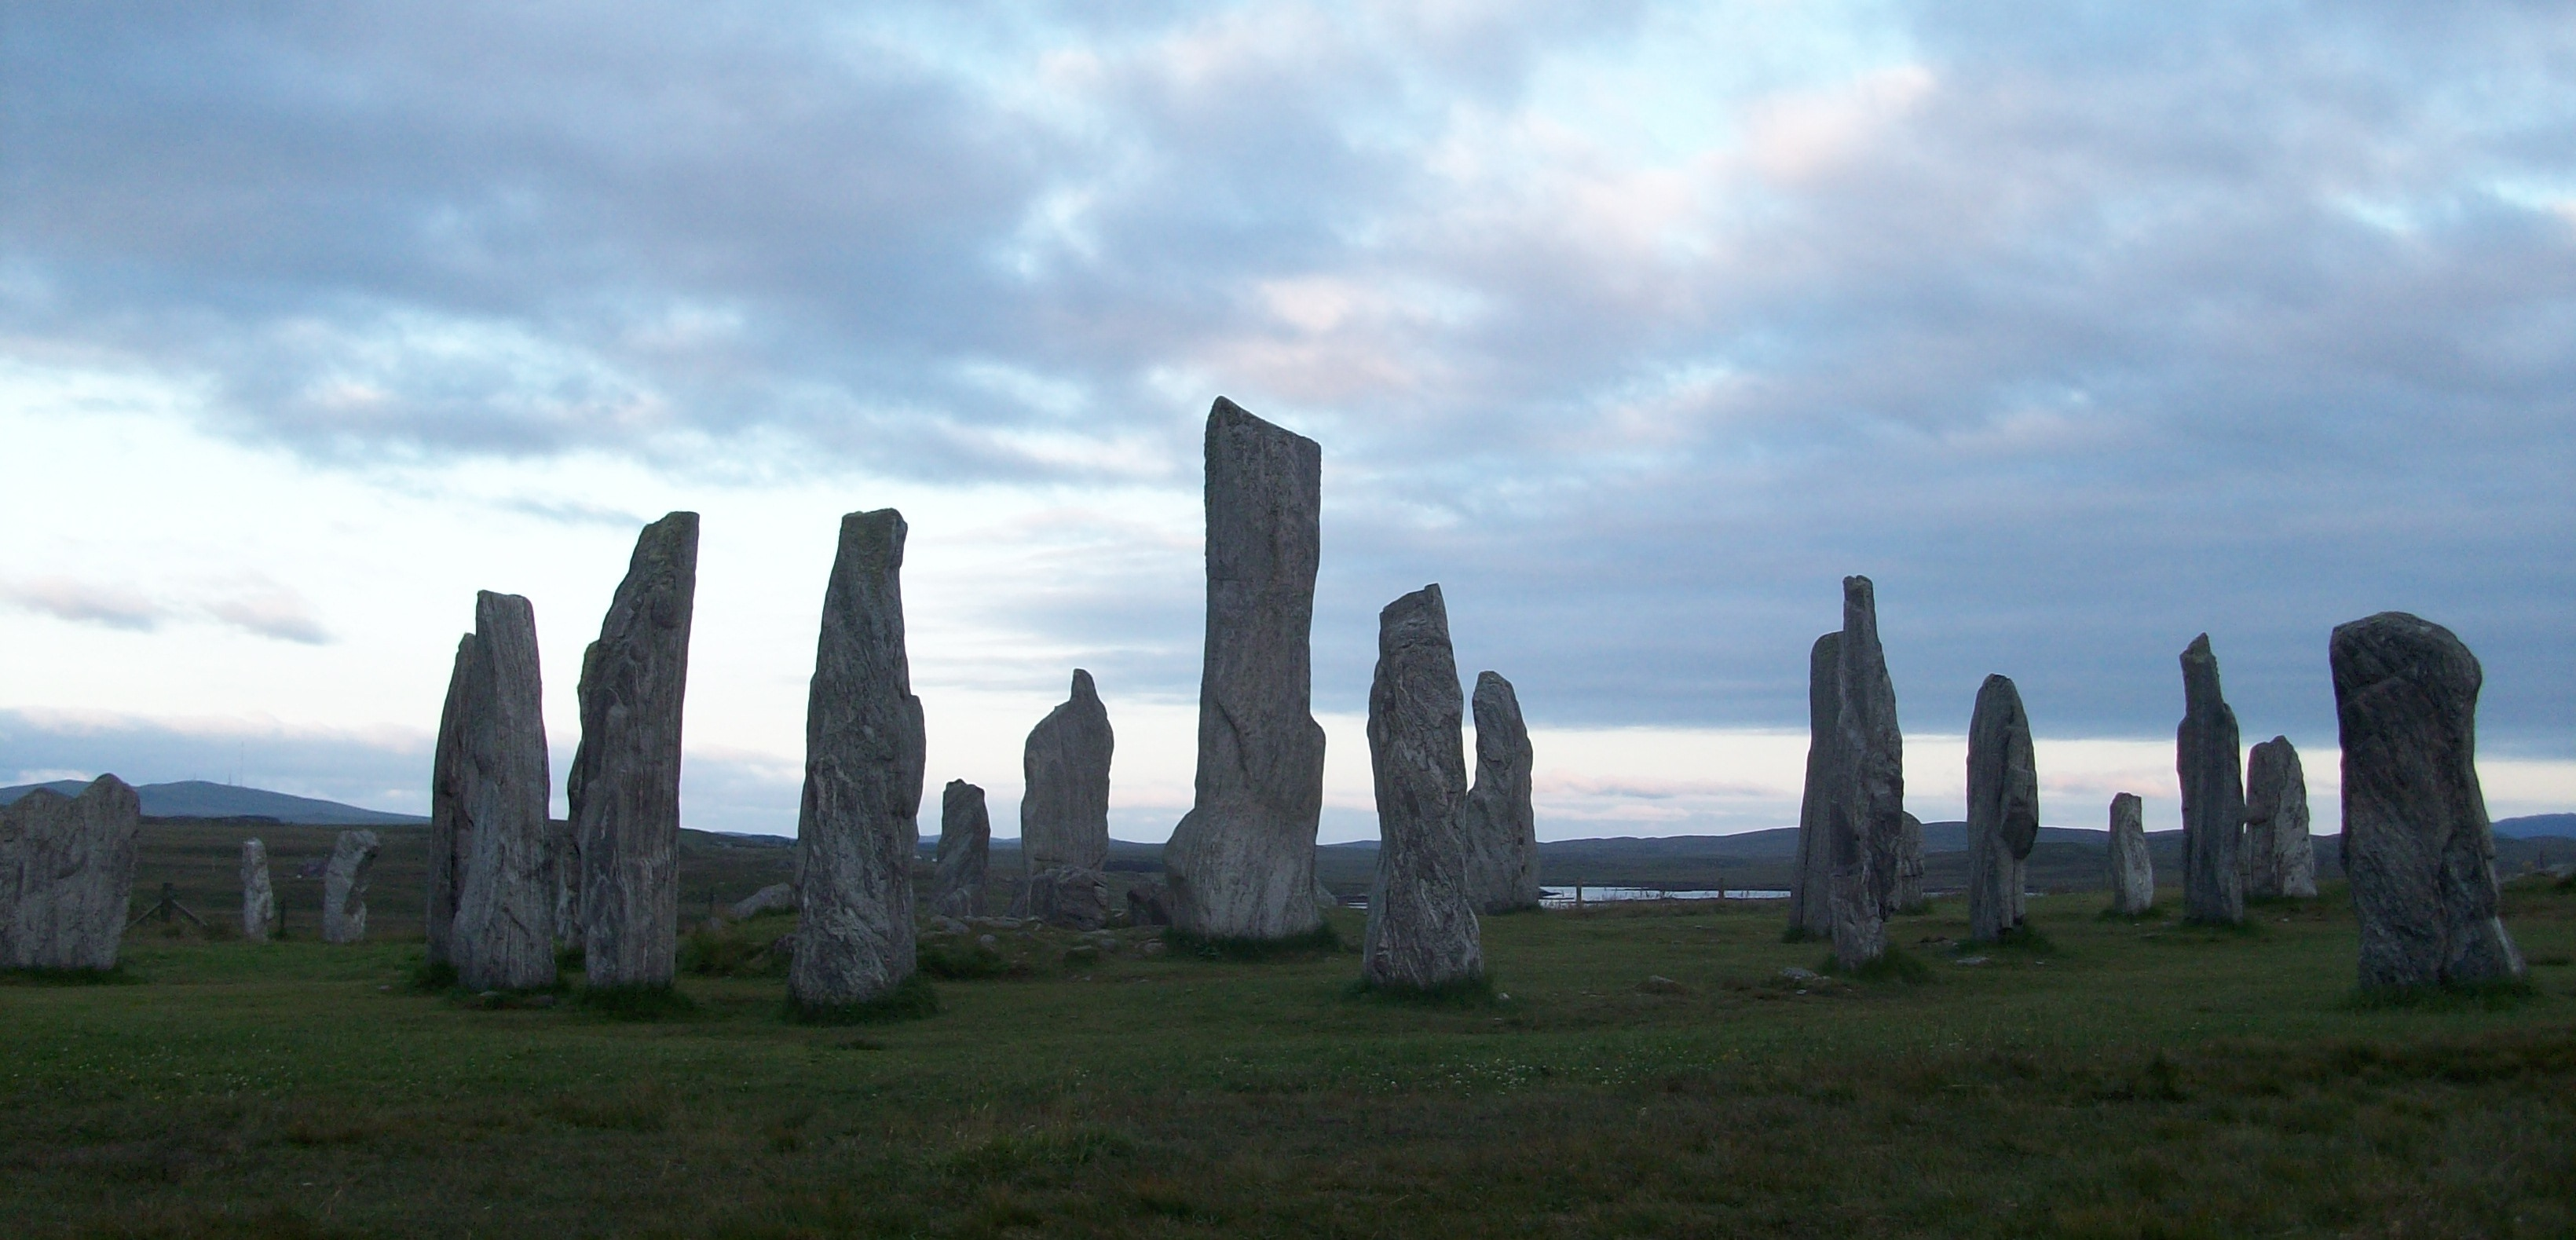 Callanish Stones on the Isle of Lewis.